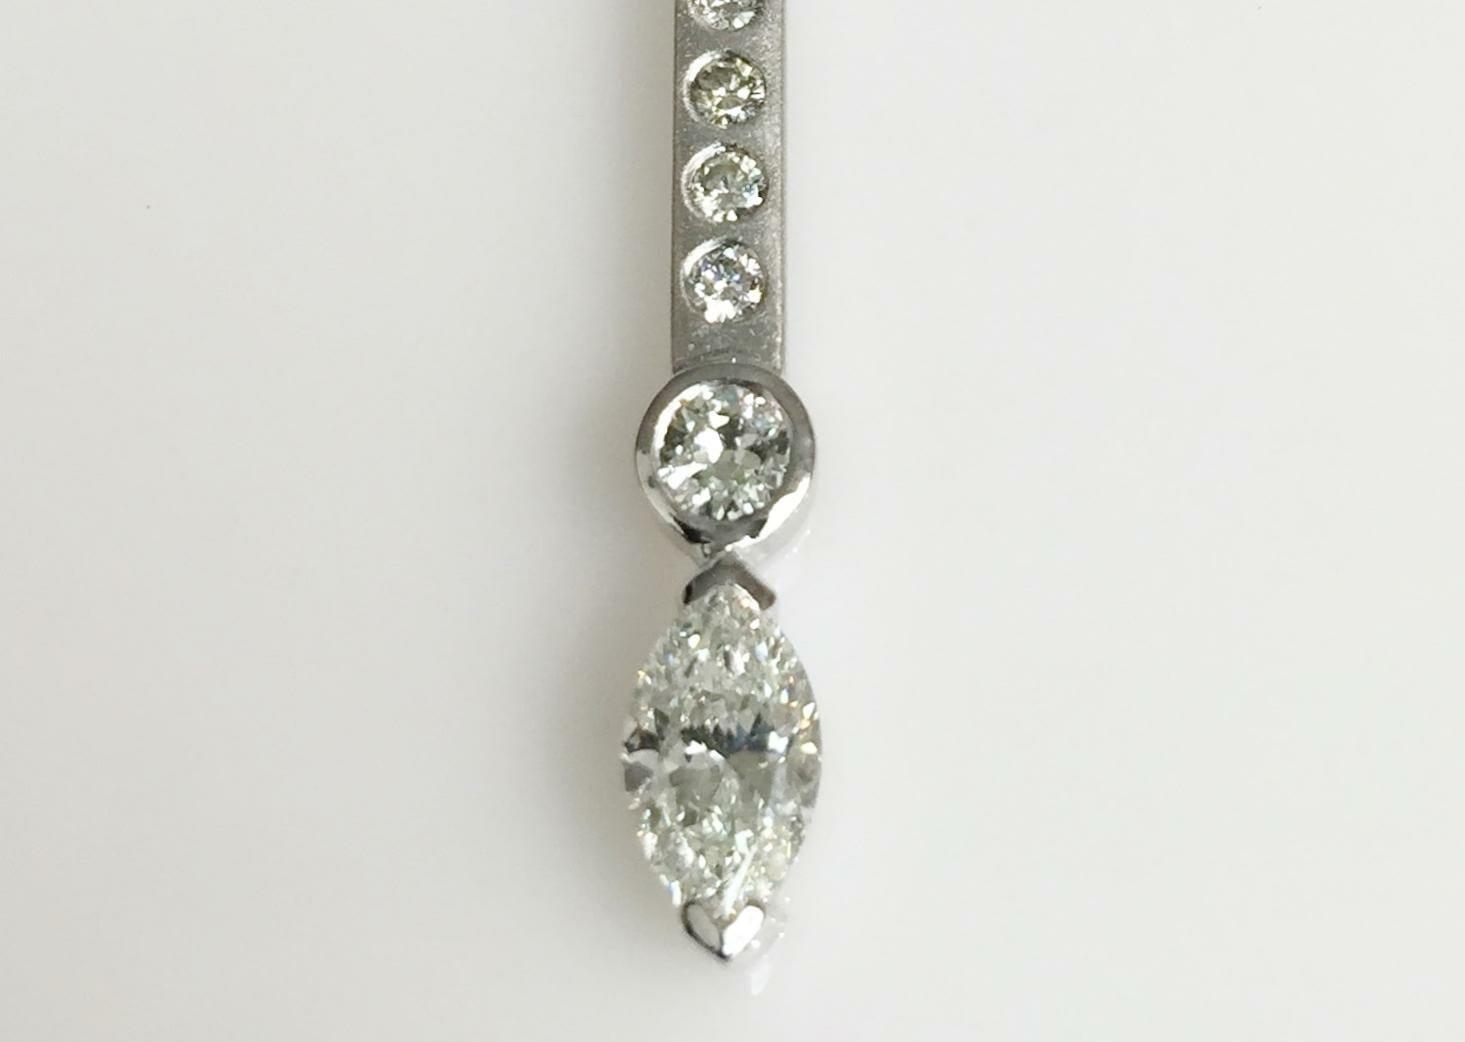 Marquise Cut Diamond Necklace Keezing Kreations Boston